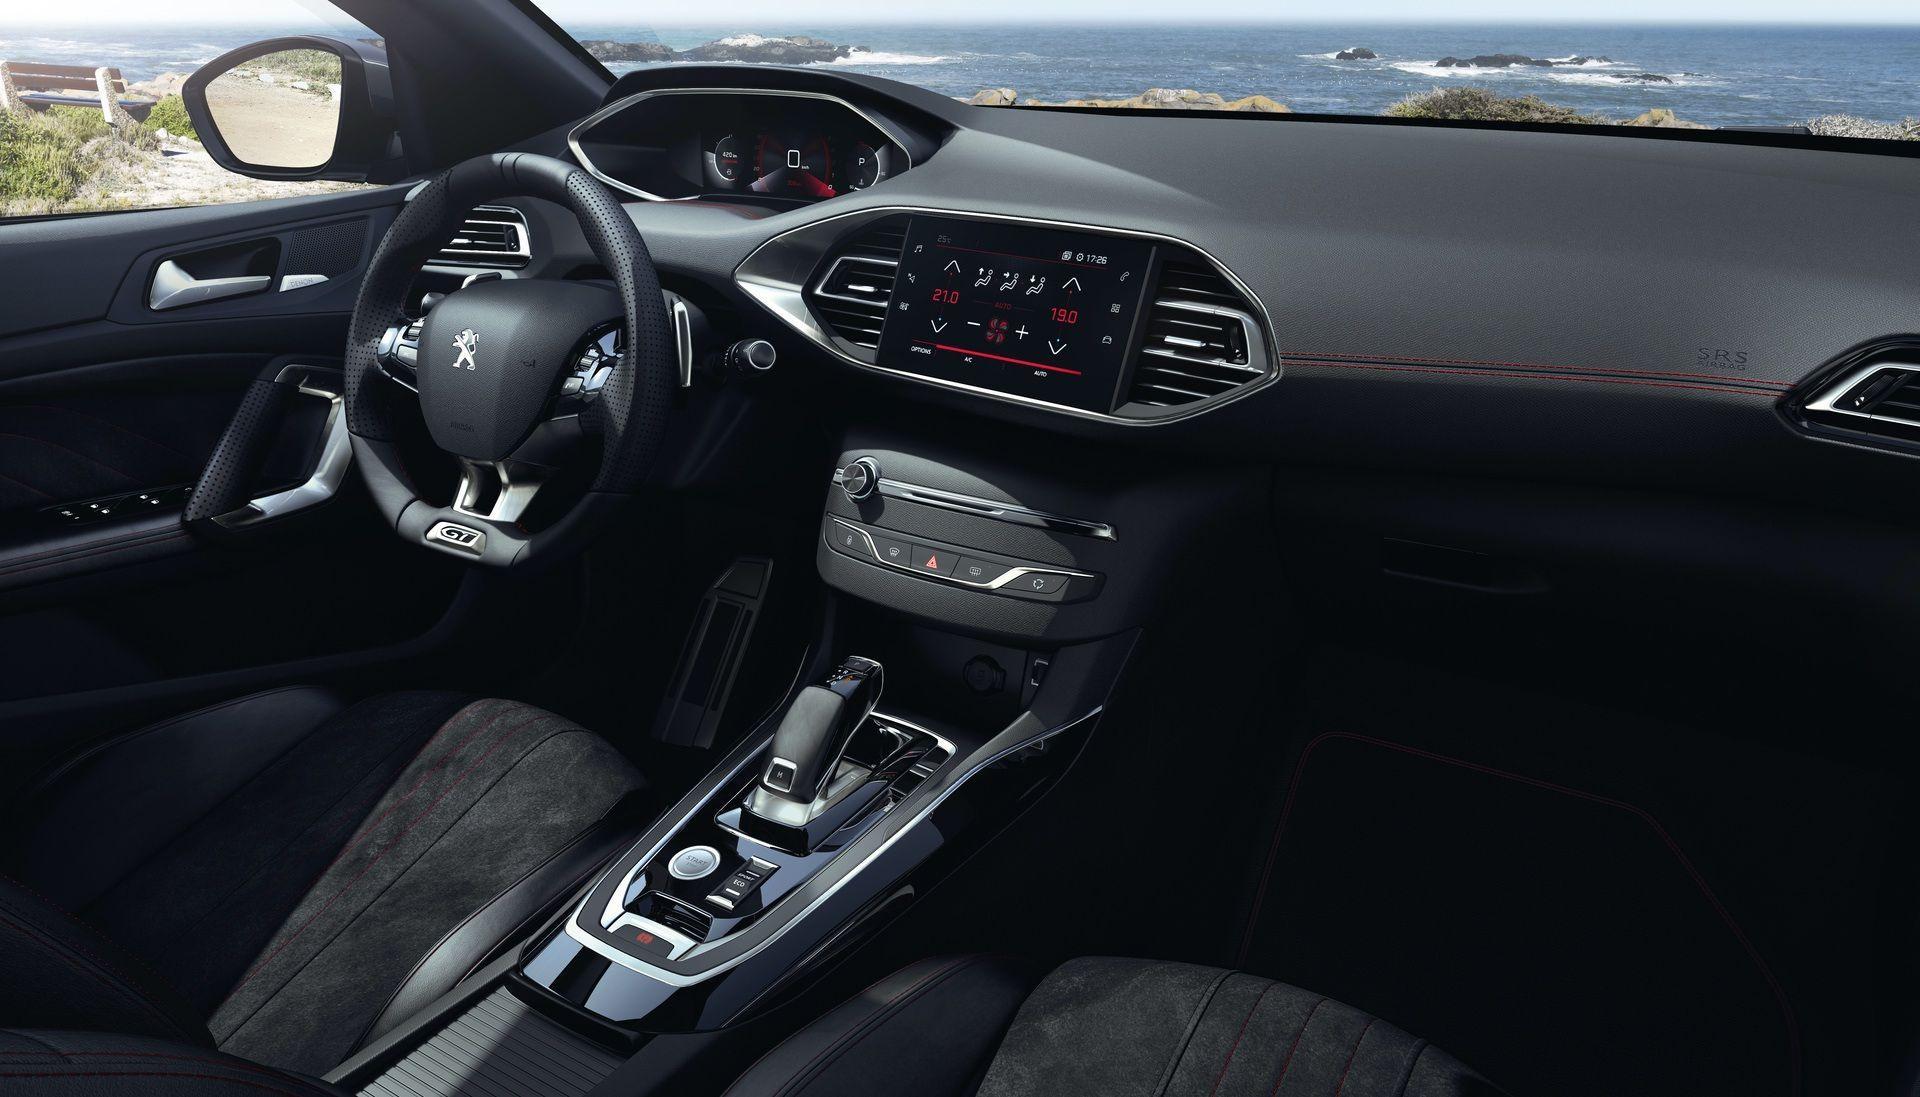 2020_Peugeot_308_facelift_0023